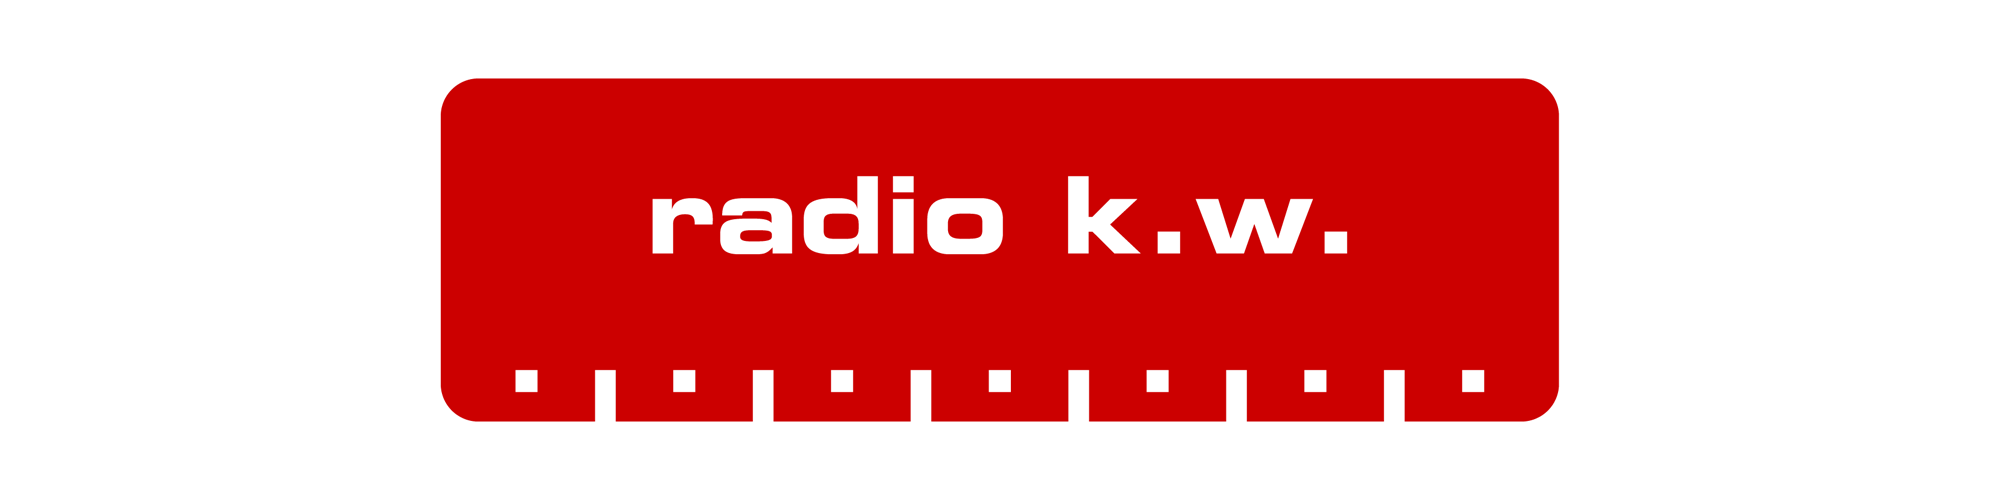 Radio K.W